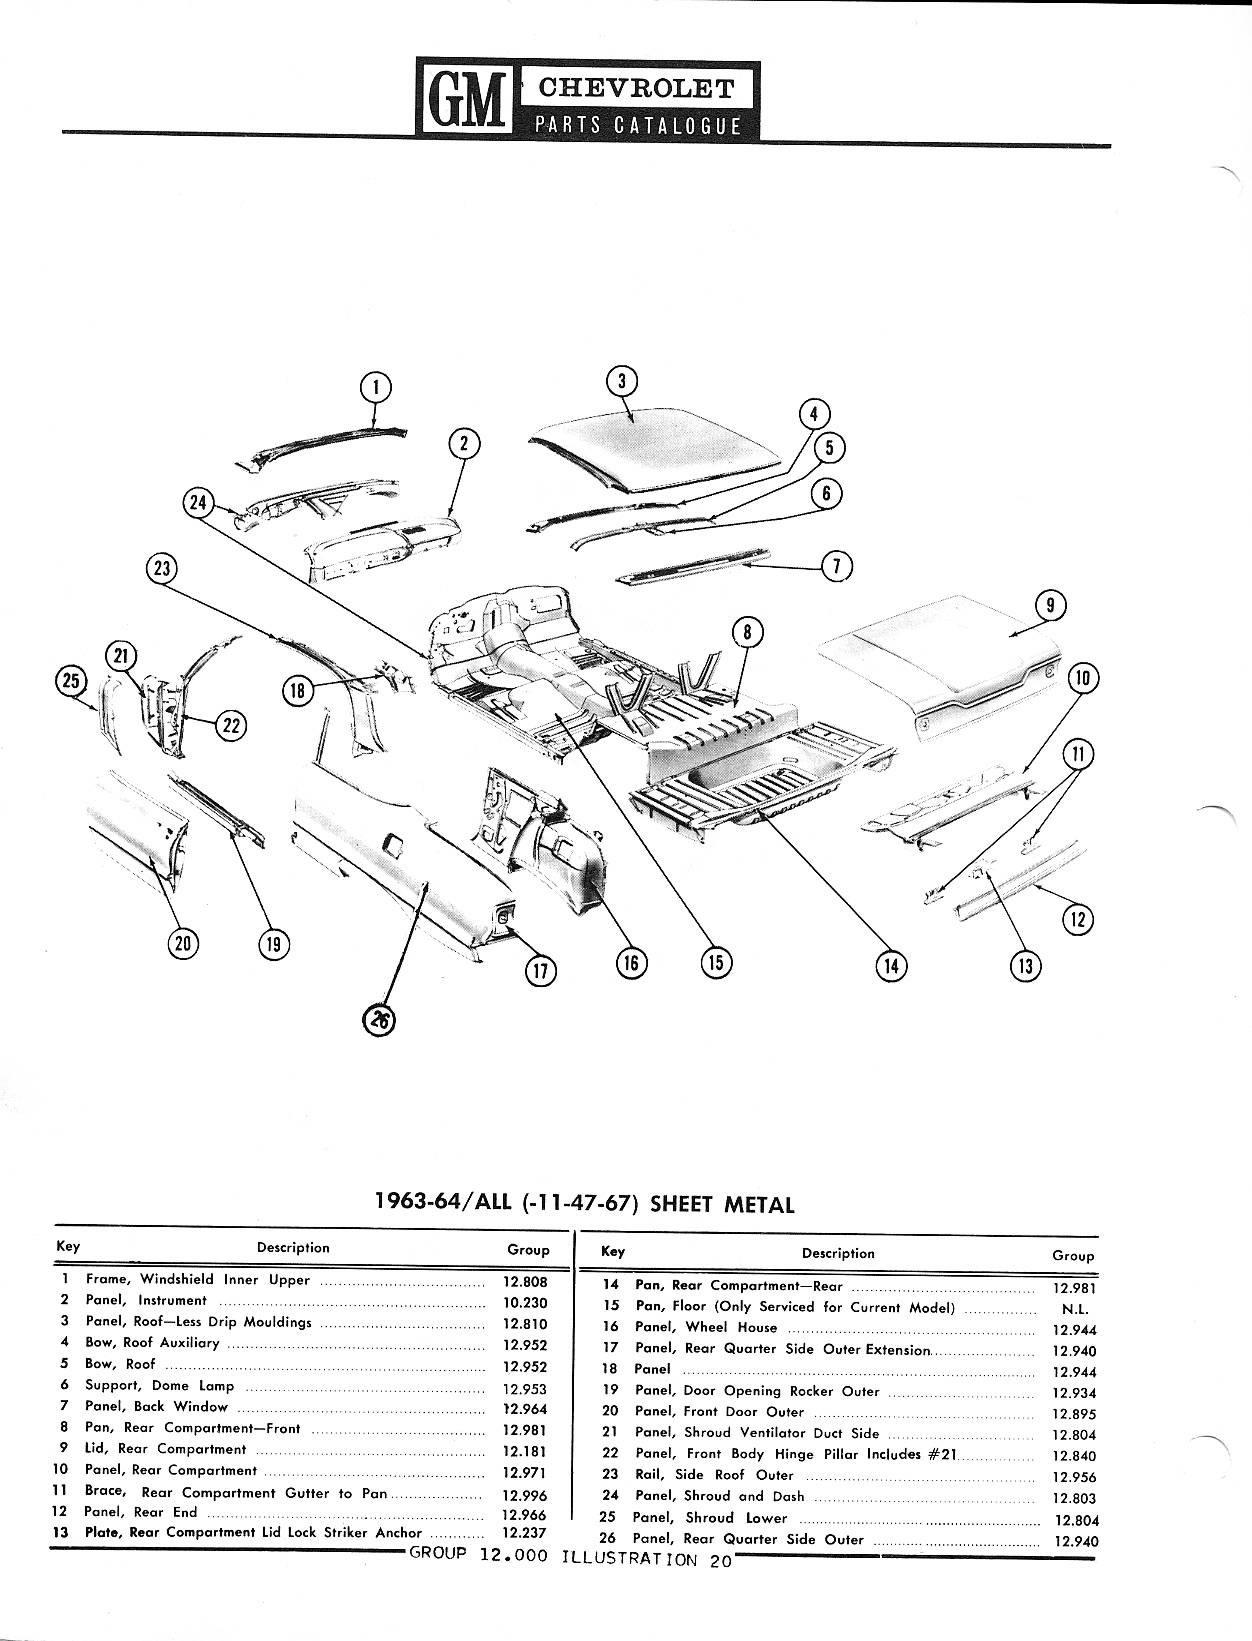 1958-1968 Chevrolet Parts Catalog / Image176.jpg